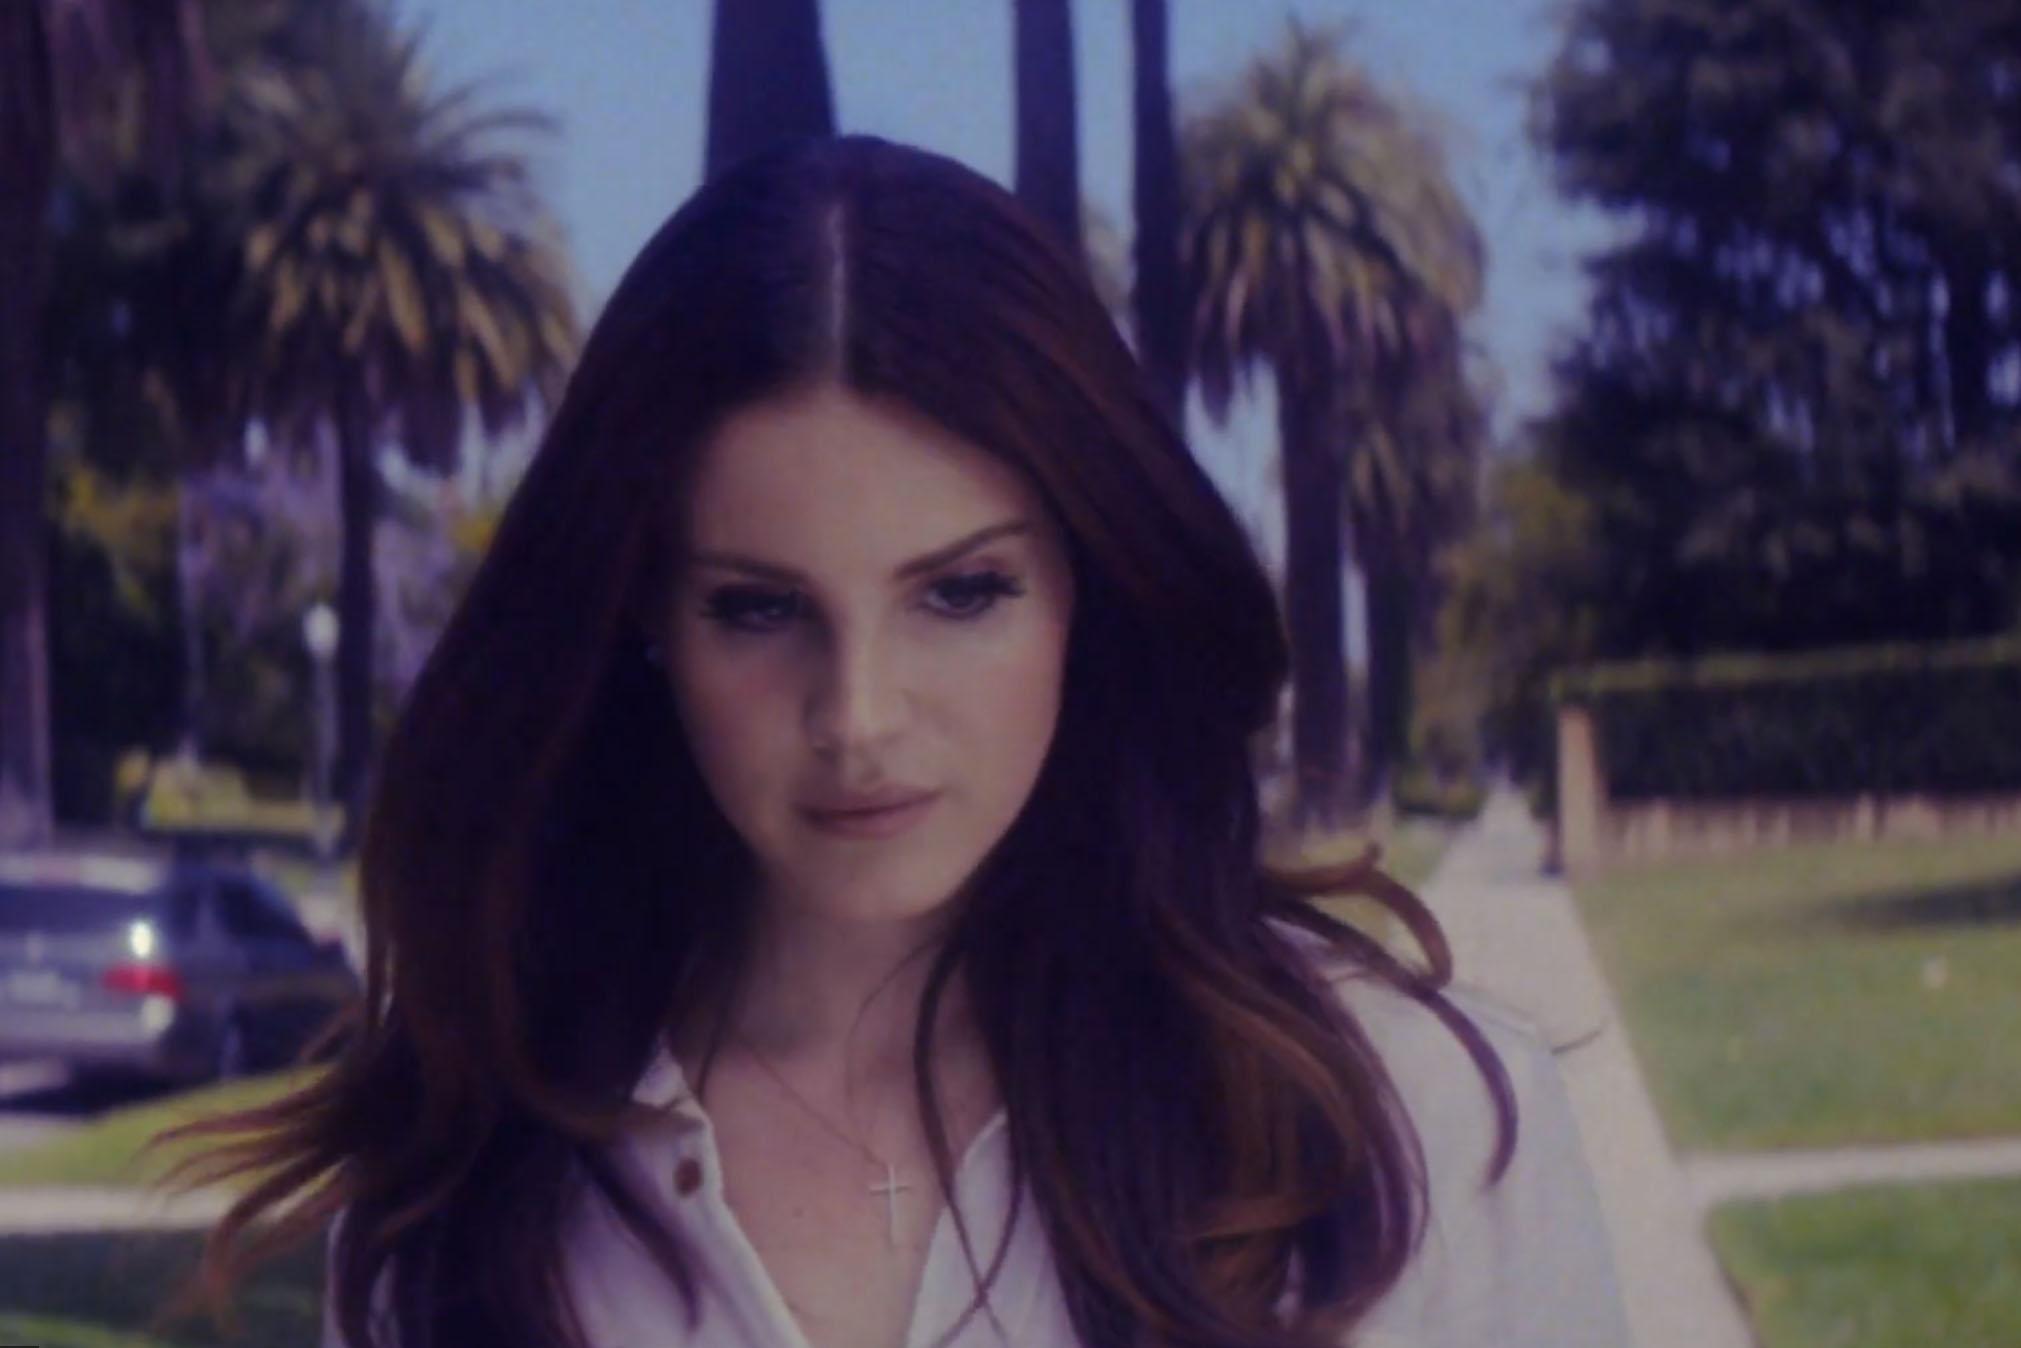 Lana Del Rey Shades of Cool